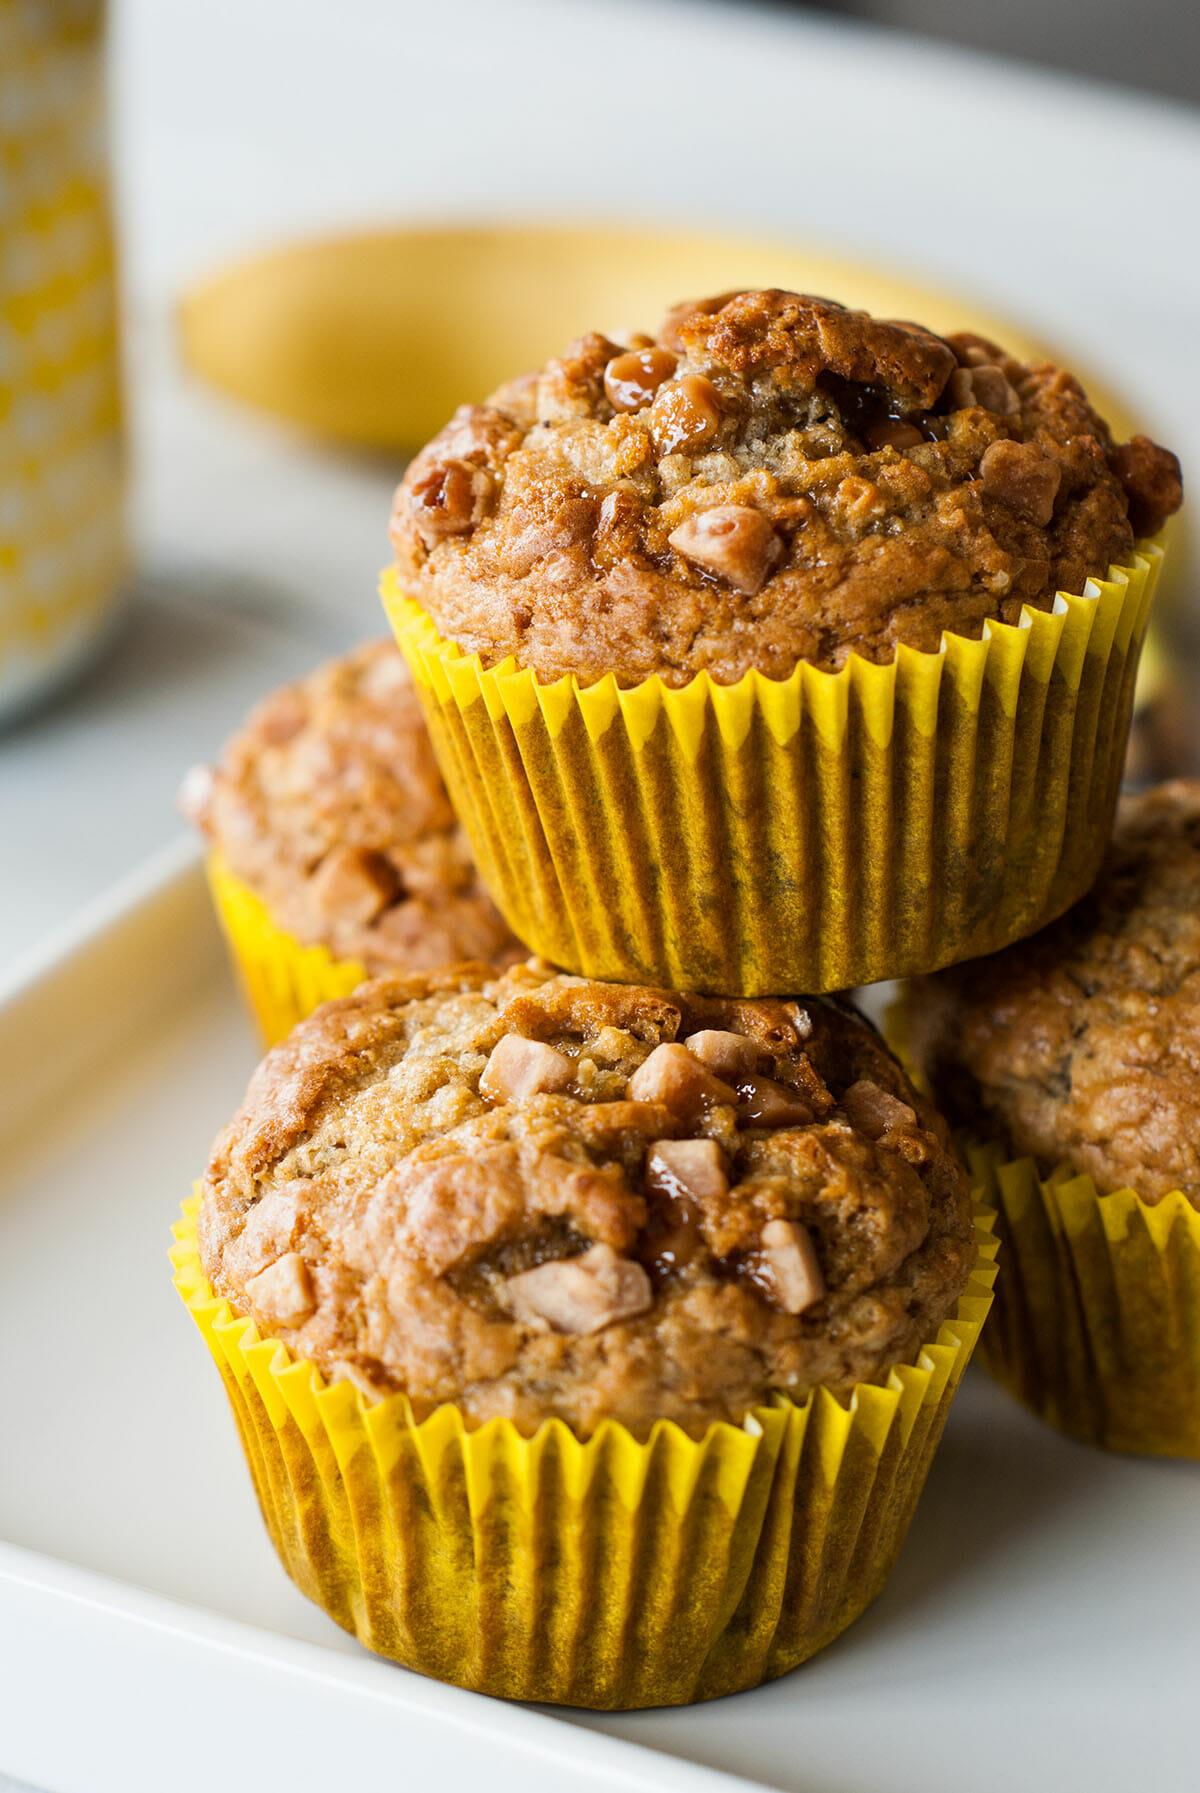 muffins-banane-caramel-fudge-liliebakery-1